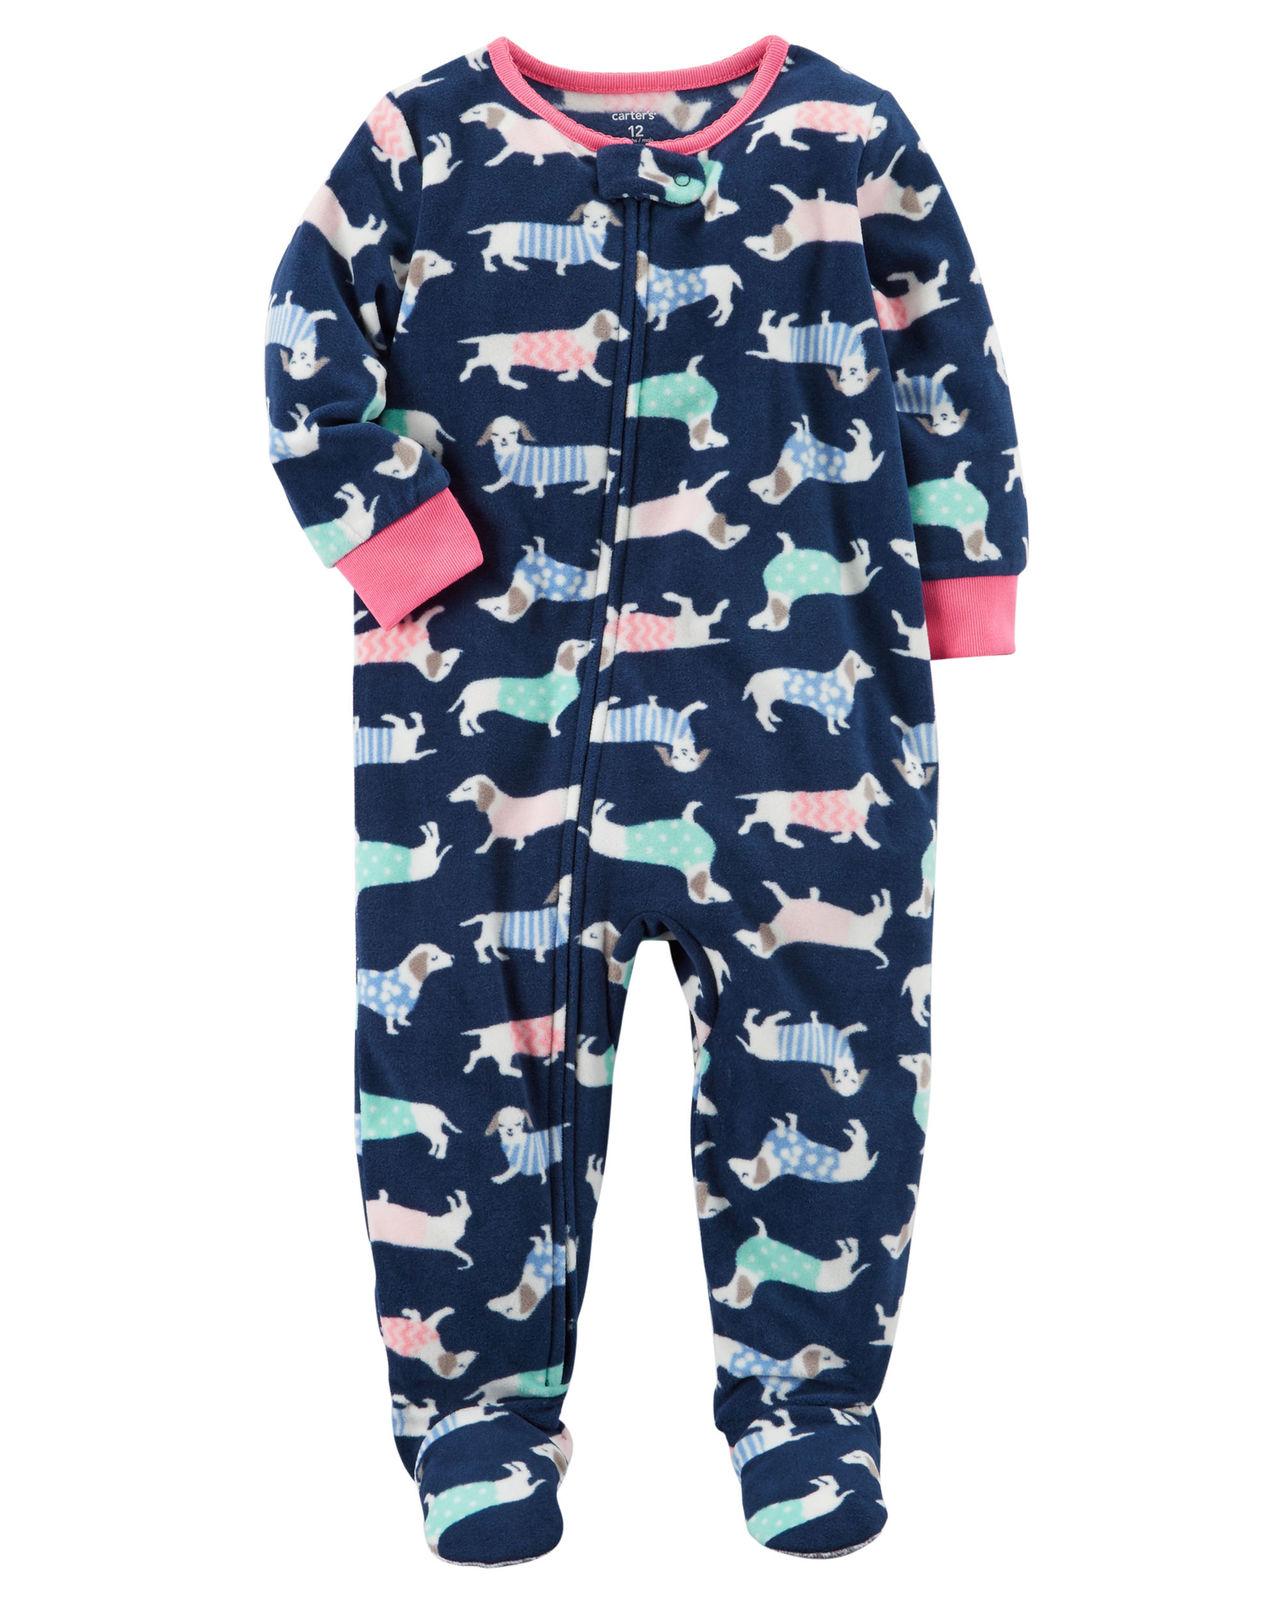 b77441a7f Carters Girls 1 Piece Footed Sleeper Zip Up Fleece Pajama